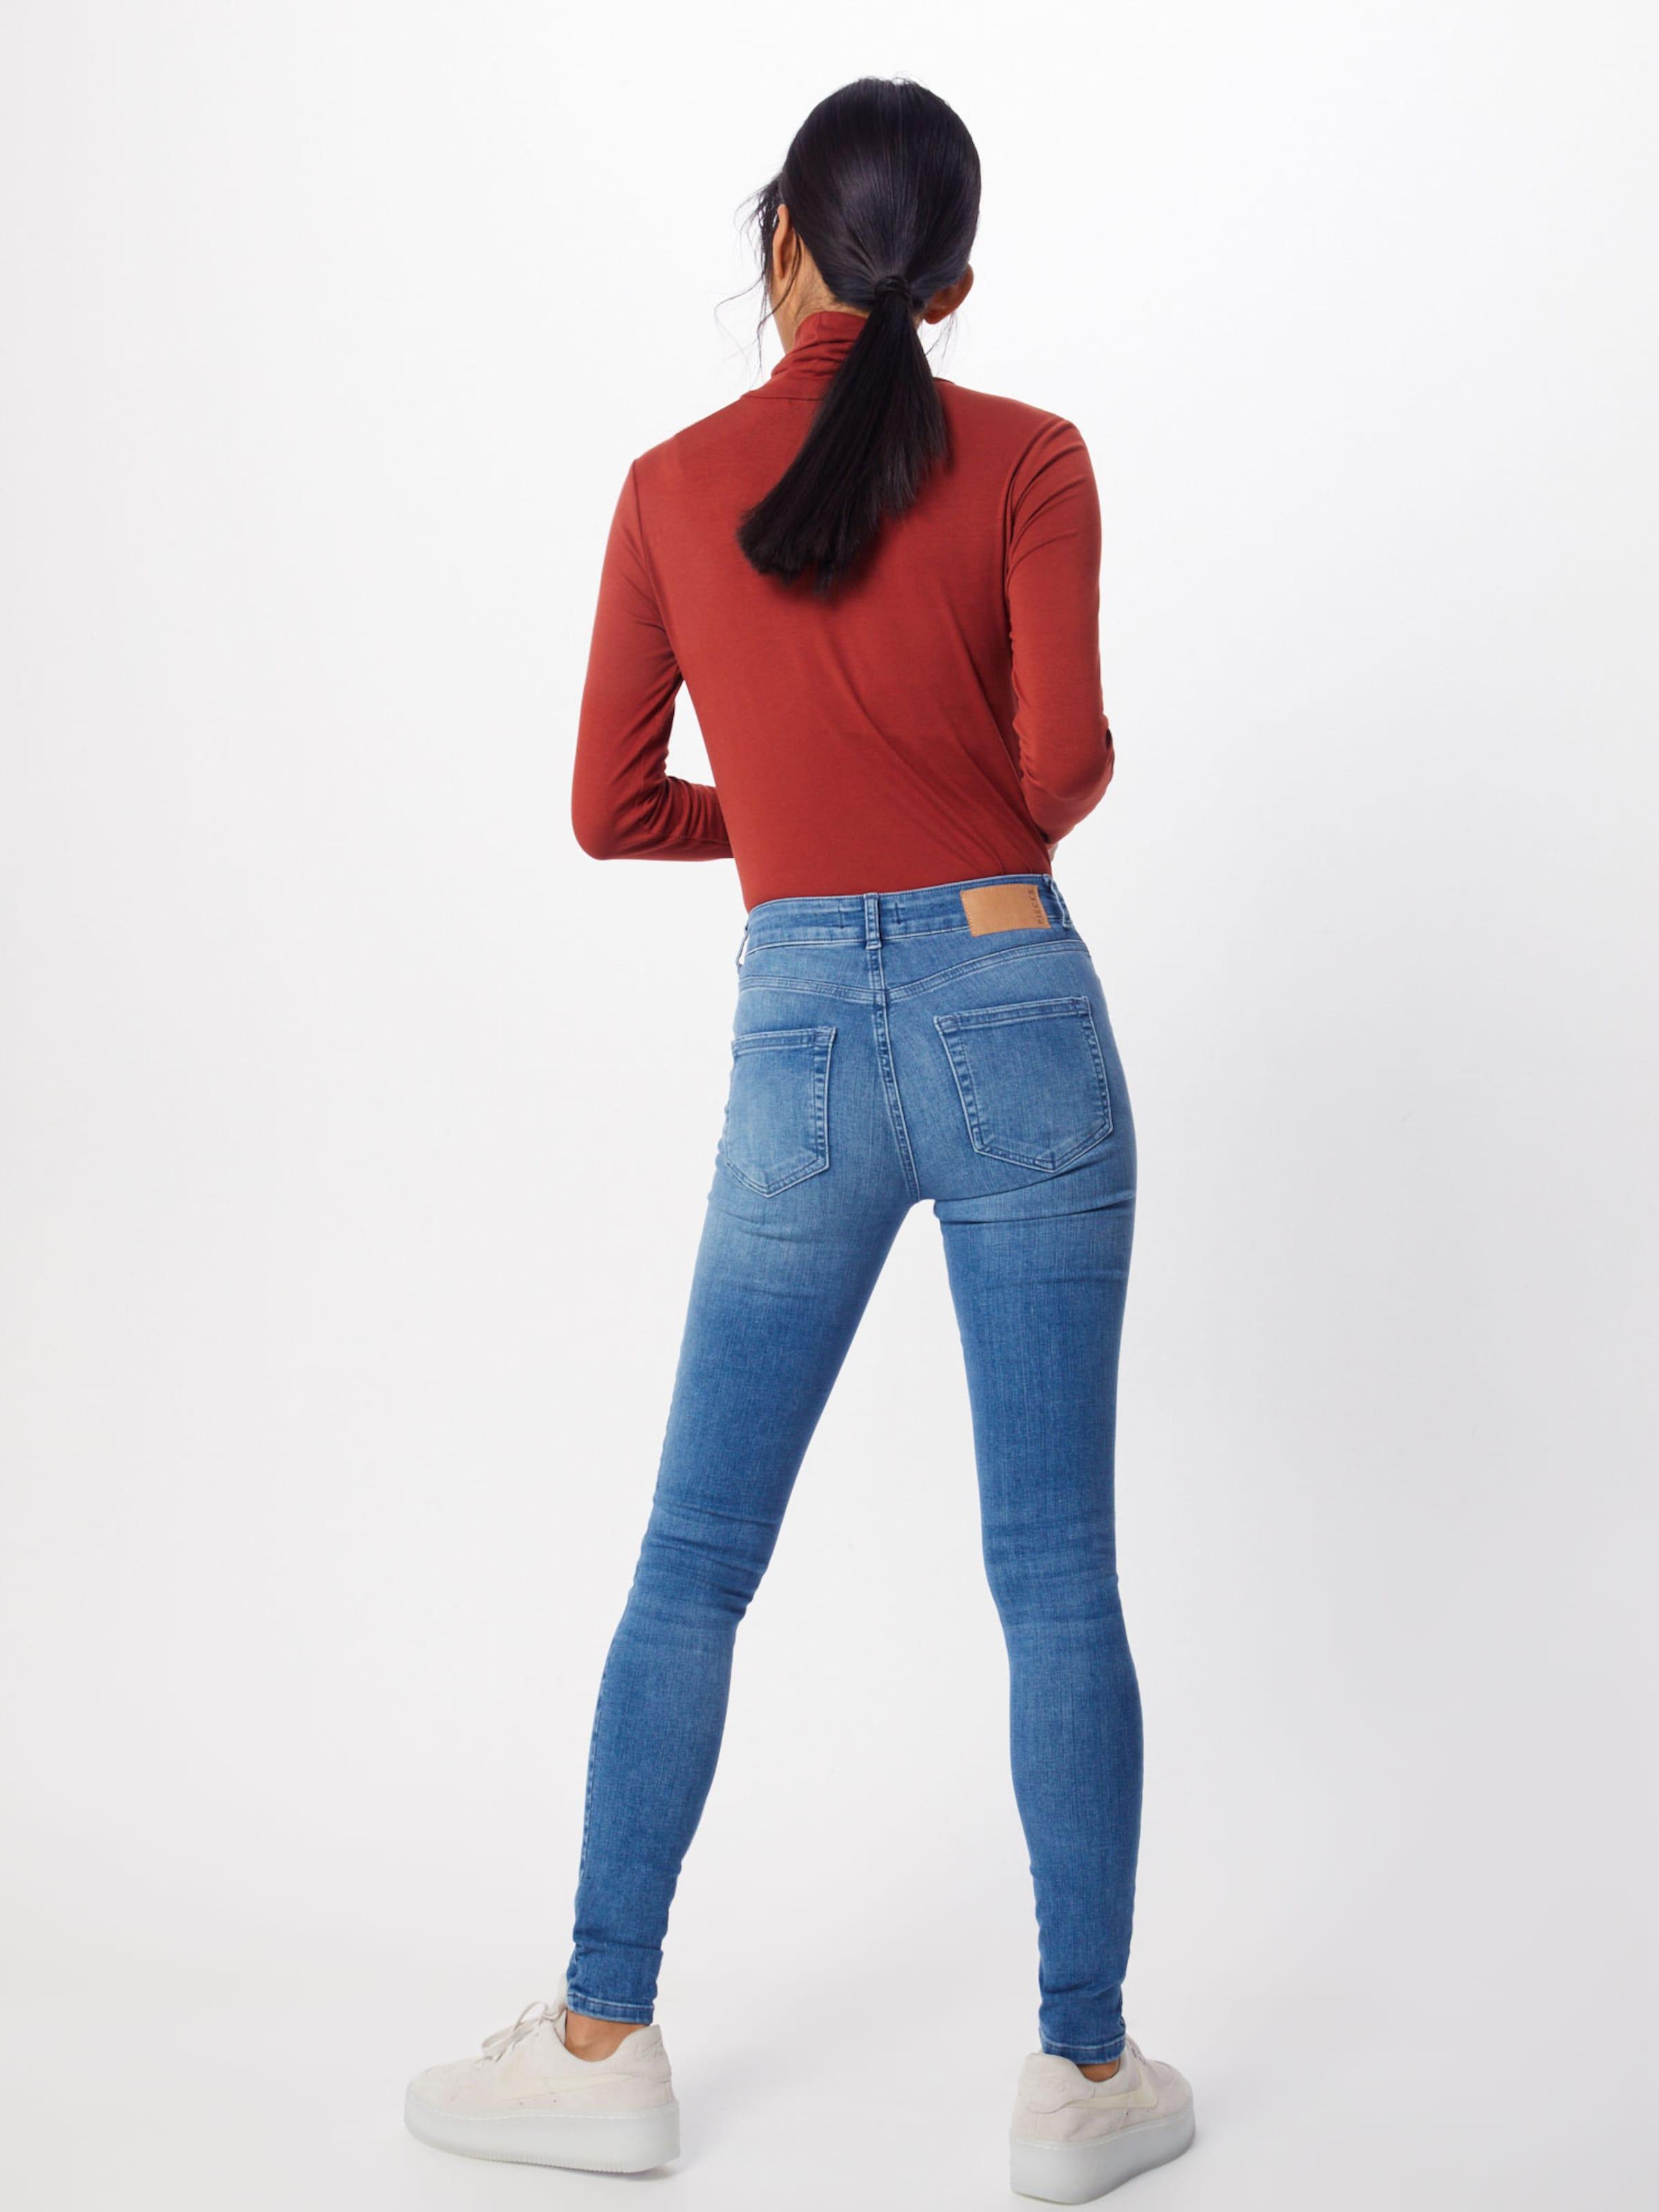 'pcdelly Denim Skn Pieces ba noos' Jeans Mw In Blue Lb124 AjL4R5